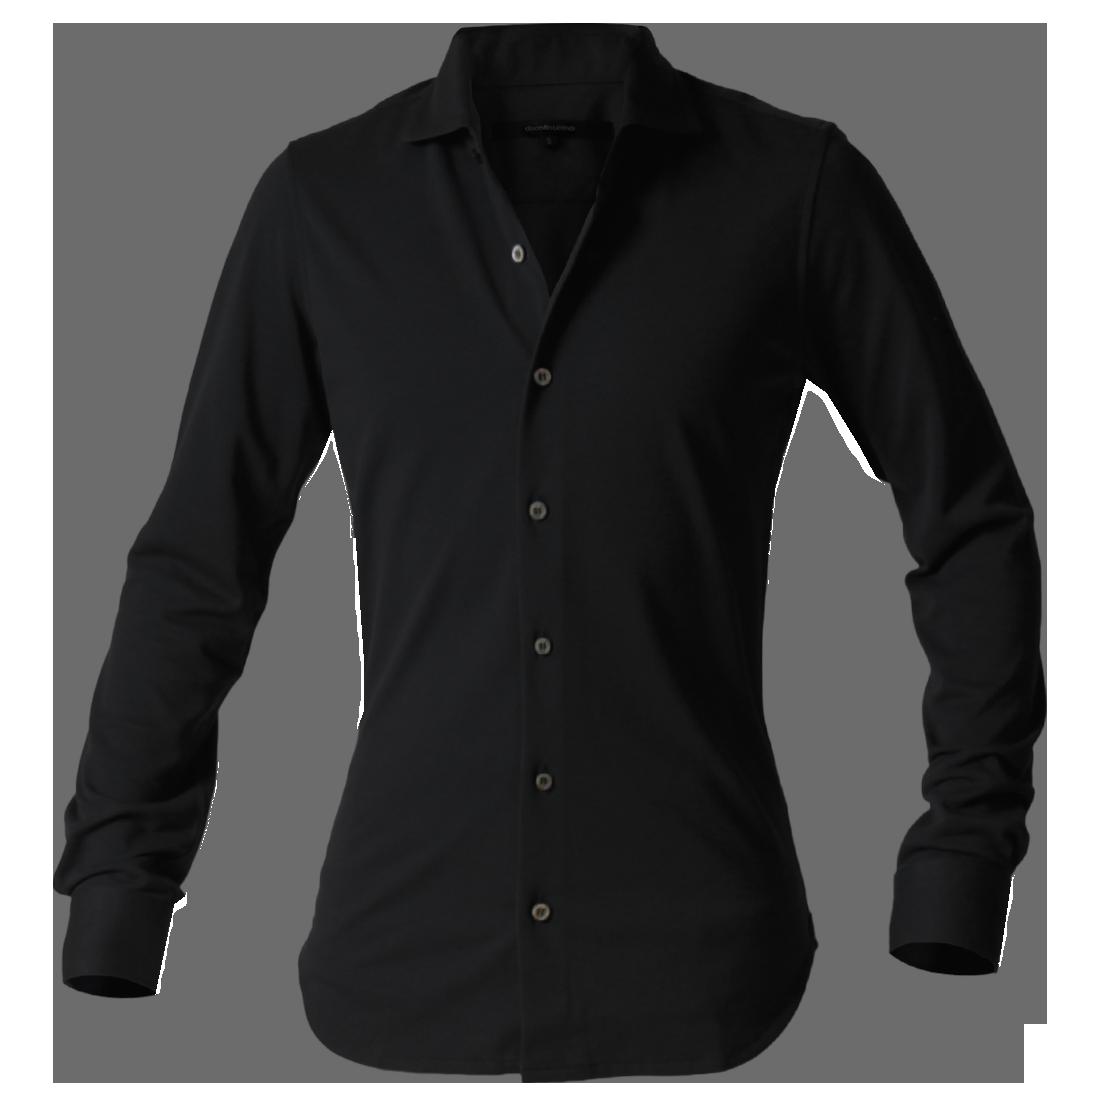 DJS-002 decollouomo メンズドレスシャツ長袖 concorde - ブラックアウト